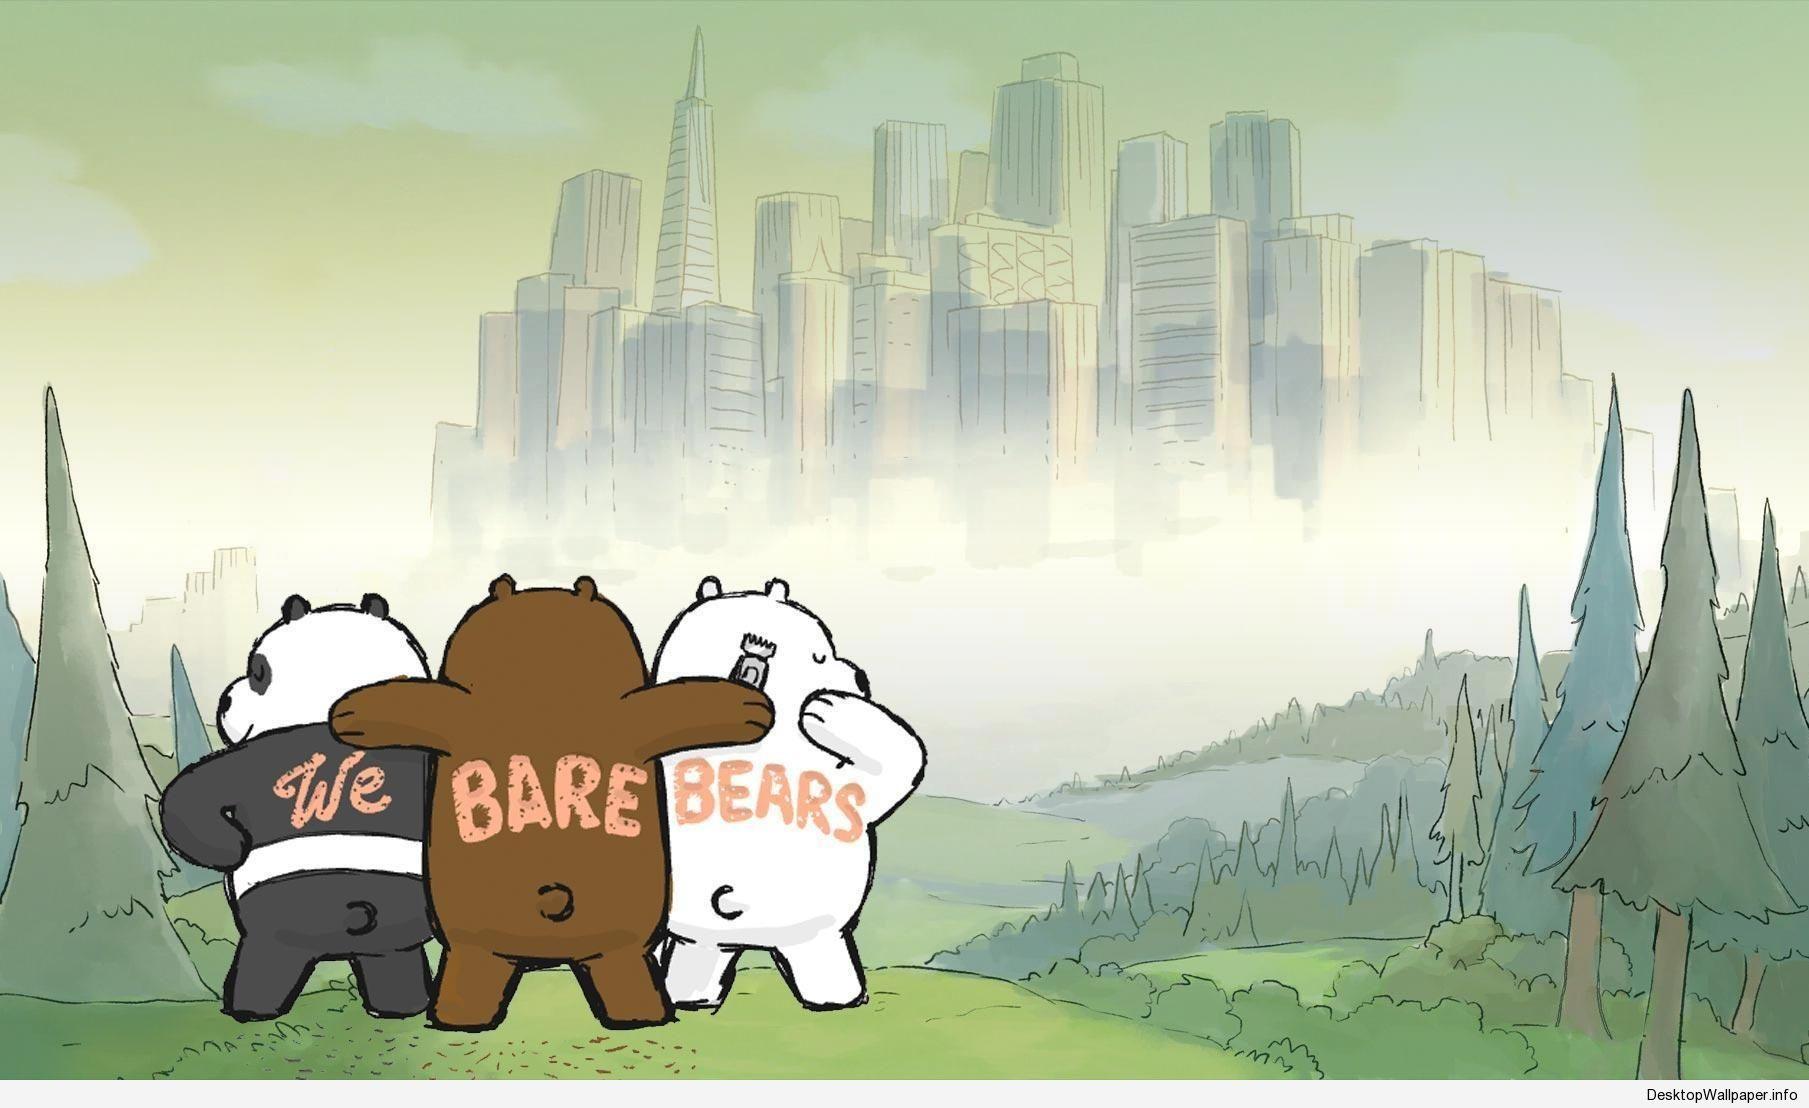 We Bare Bears Wallpaper Hd Desktop Http Desktopwallpaper Info We Bare Bears Wallpaper Hd Desktop 2 12 Bear Wallpaper We Bare Bears Wallpapers We Bare Bears